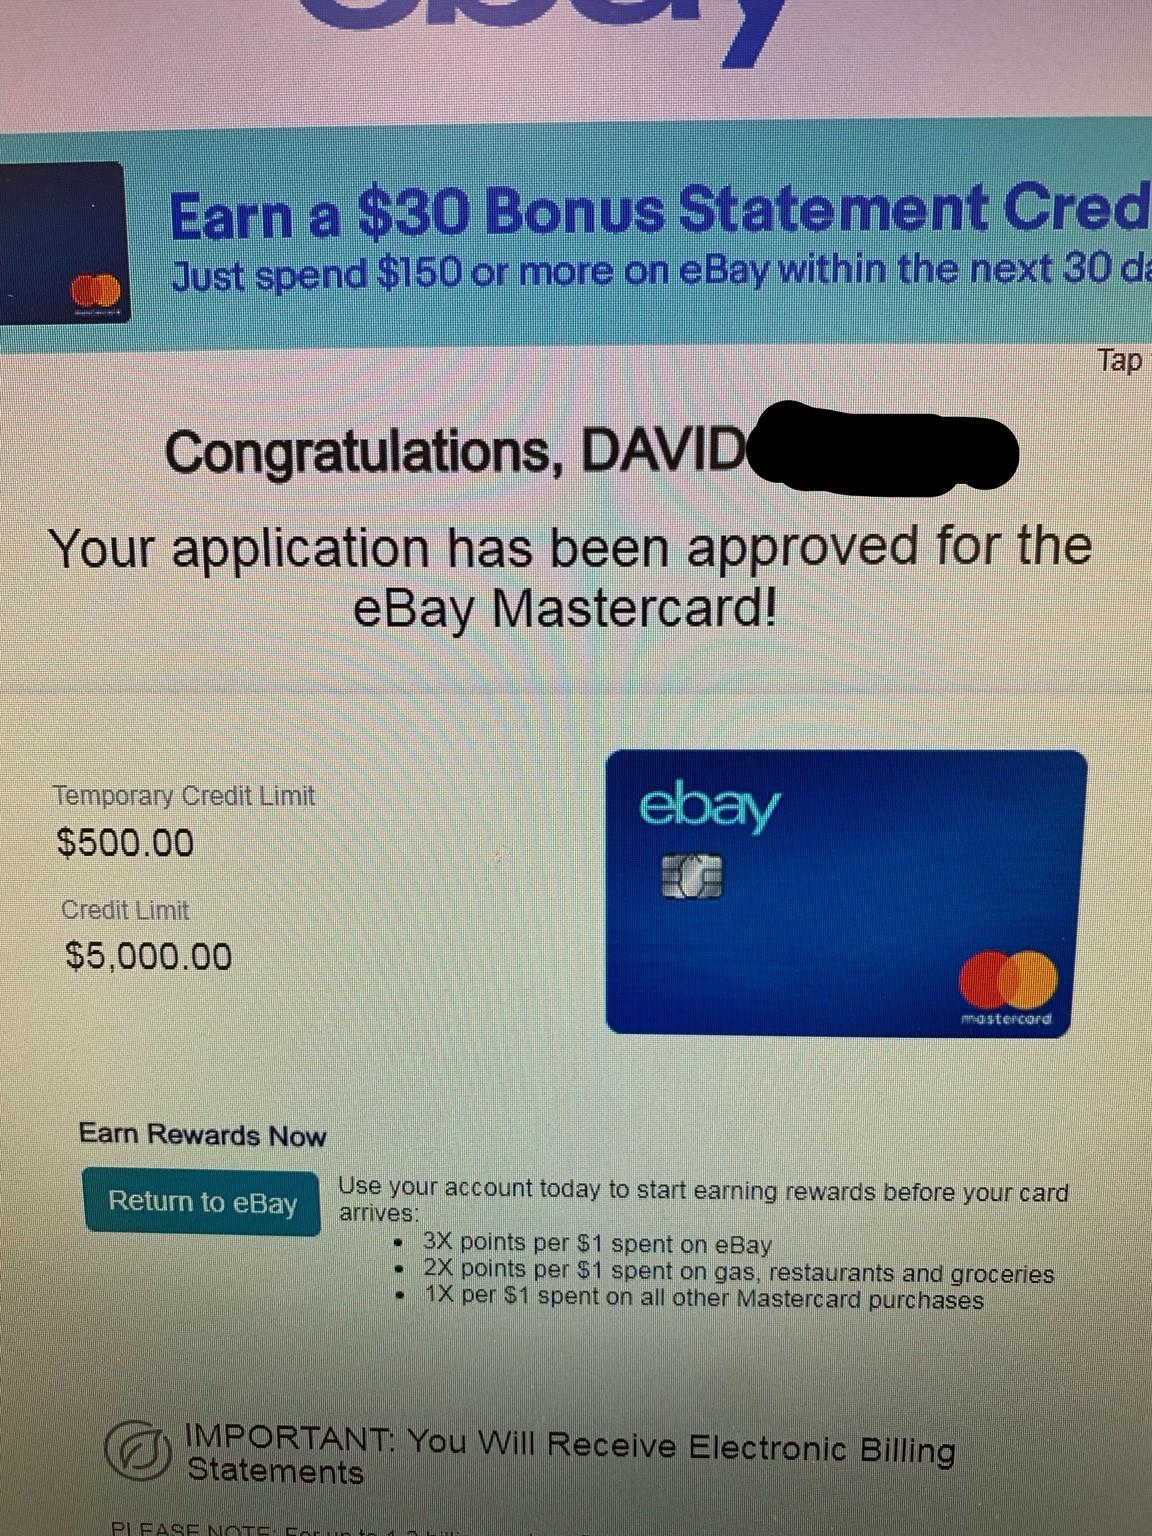 Synchrony loves me suddenly (Ebay Mastercard appro - myFICO